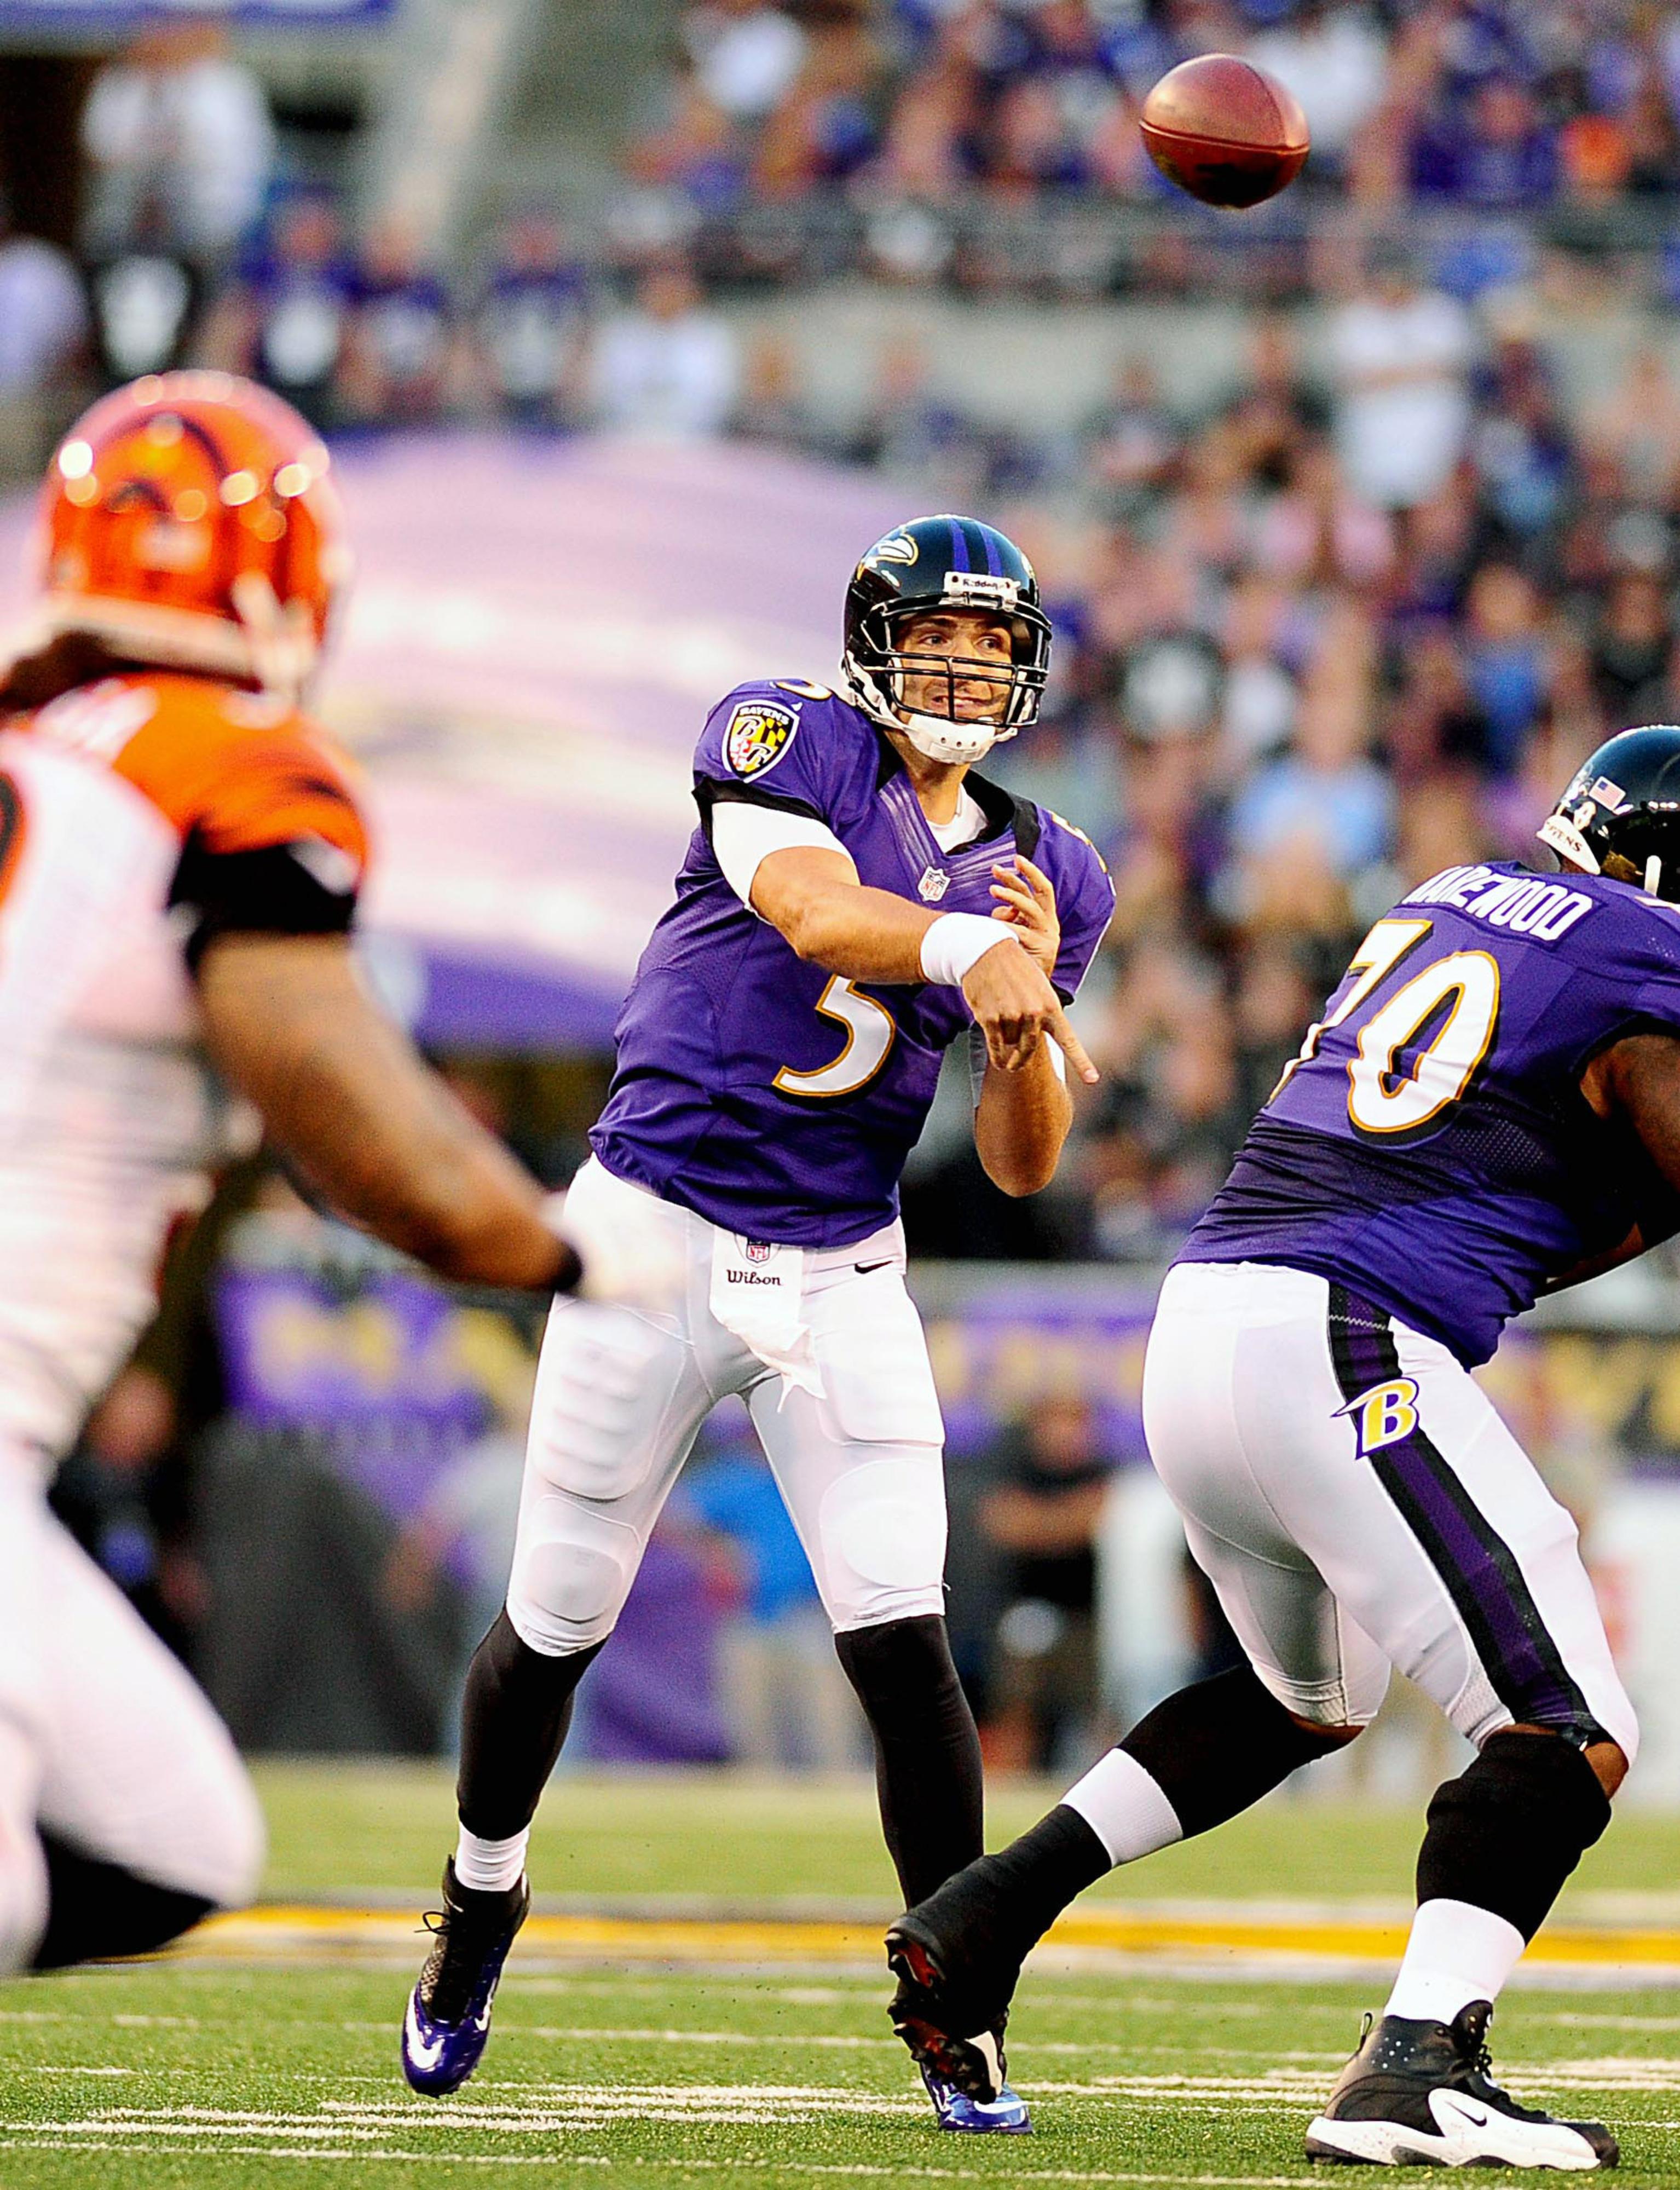 September 10, 2012; Baltimore, MD, USA; Baltimore Ravens quarterback Joe Flacco (5) throws a pass during the game against the Cincinnati Bengals at M&T Bank Stadium. Mandatory Credit: Evan Habeeb-US PRESSWIRE